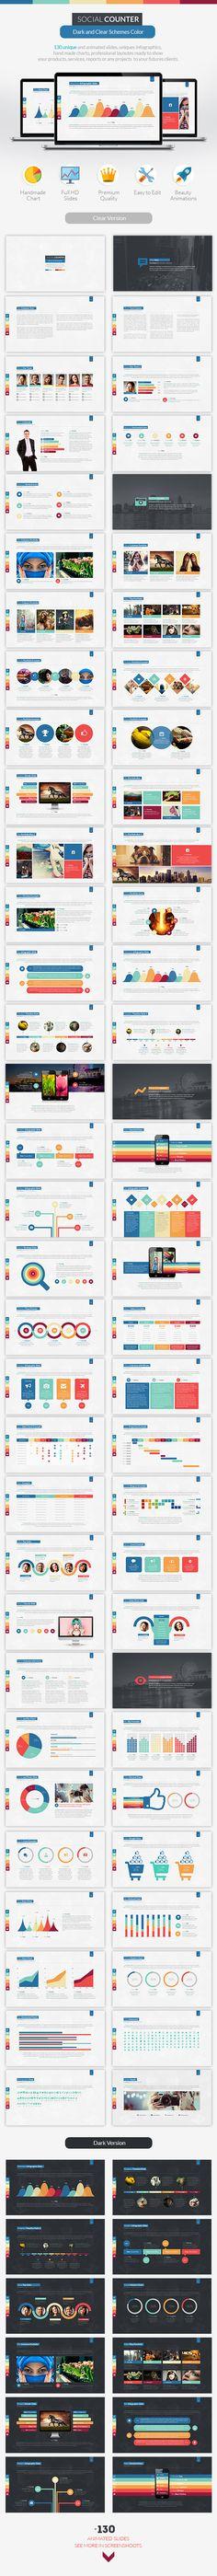 Social Counter | Keynote Presentation Template | #keynotetemplate #keynotepresentation | Buy and Download: http://graphicriver.net/item/social-counter-keynote-presentation/9459546?ref=ksioks